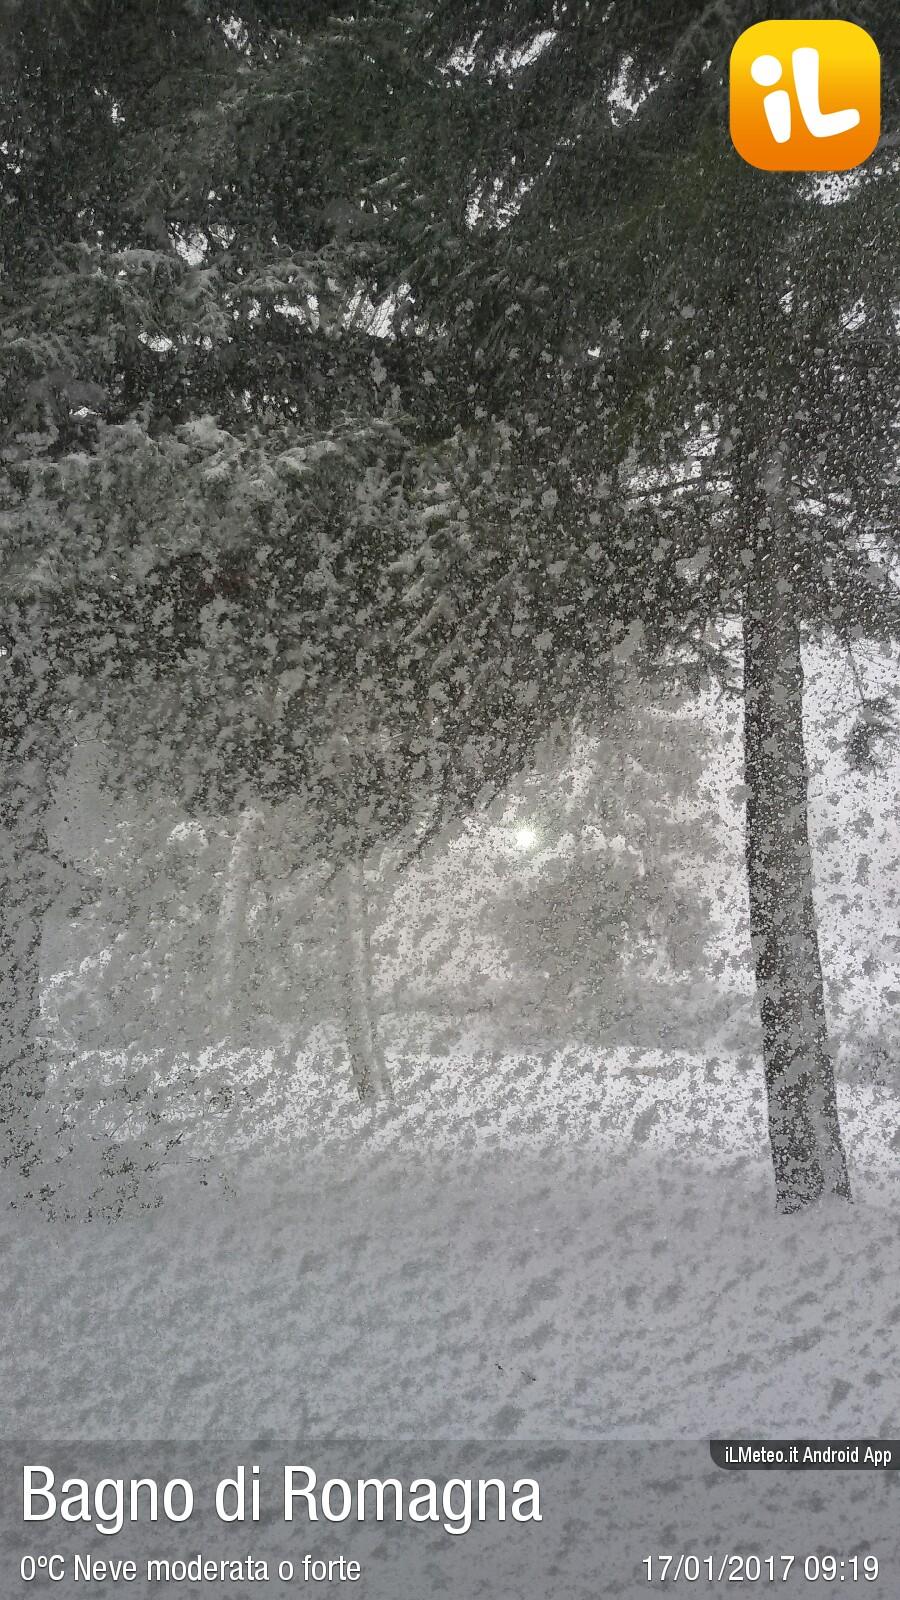 Foto meteo bagno di romagna bagno di romagna ore 9 19 - Meteo it bagno di romagna ...